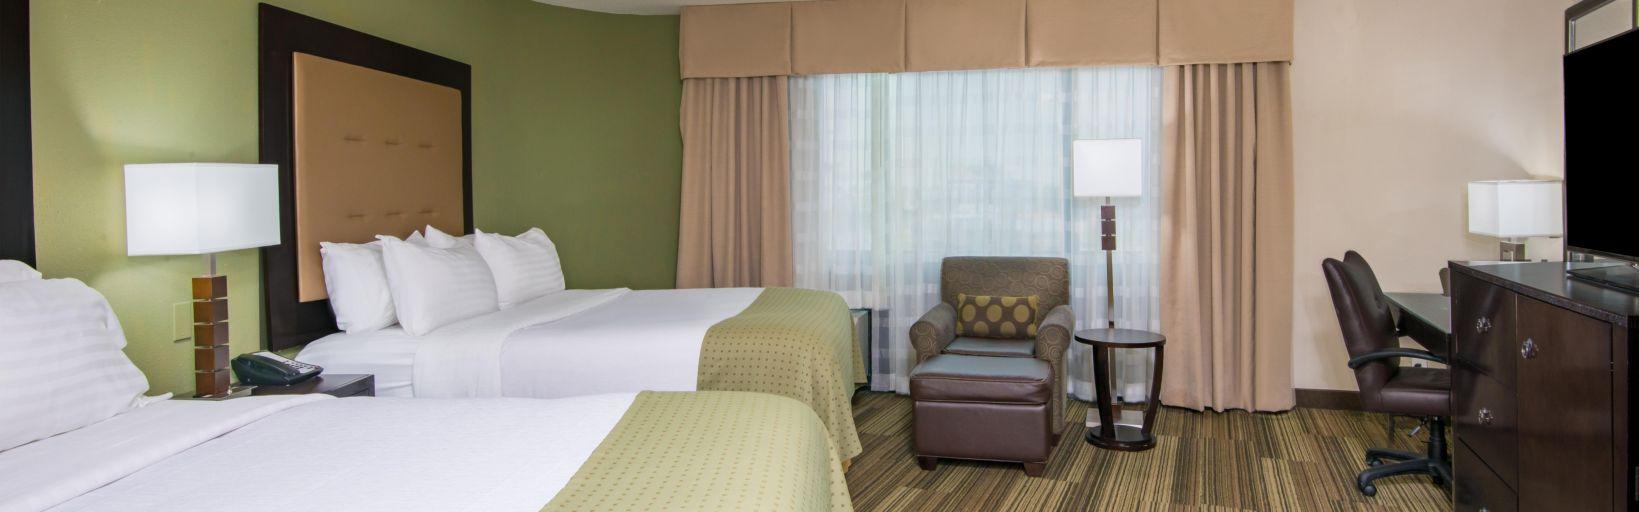 Hotel-Double.jpg